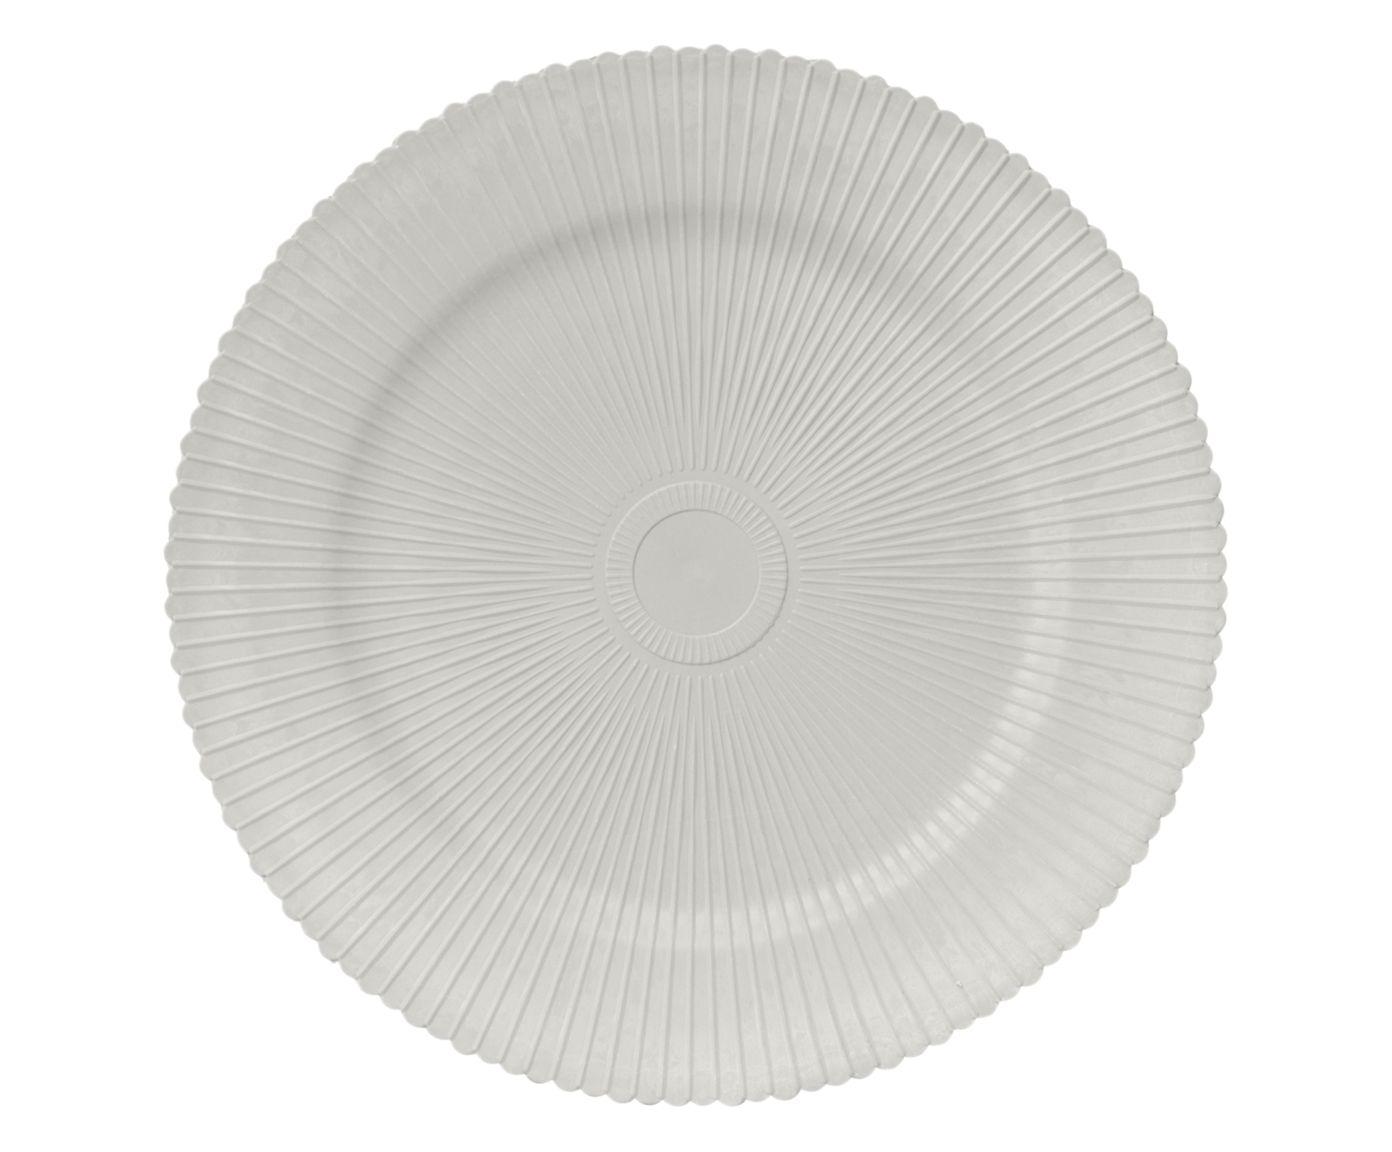 Sousplat Ônix Branco - 33cm | Westwing.com.br